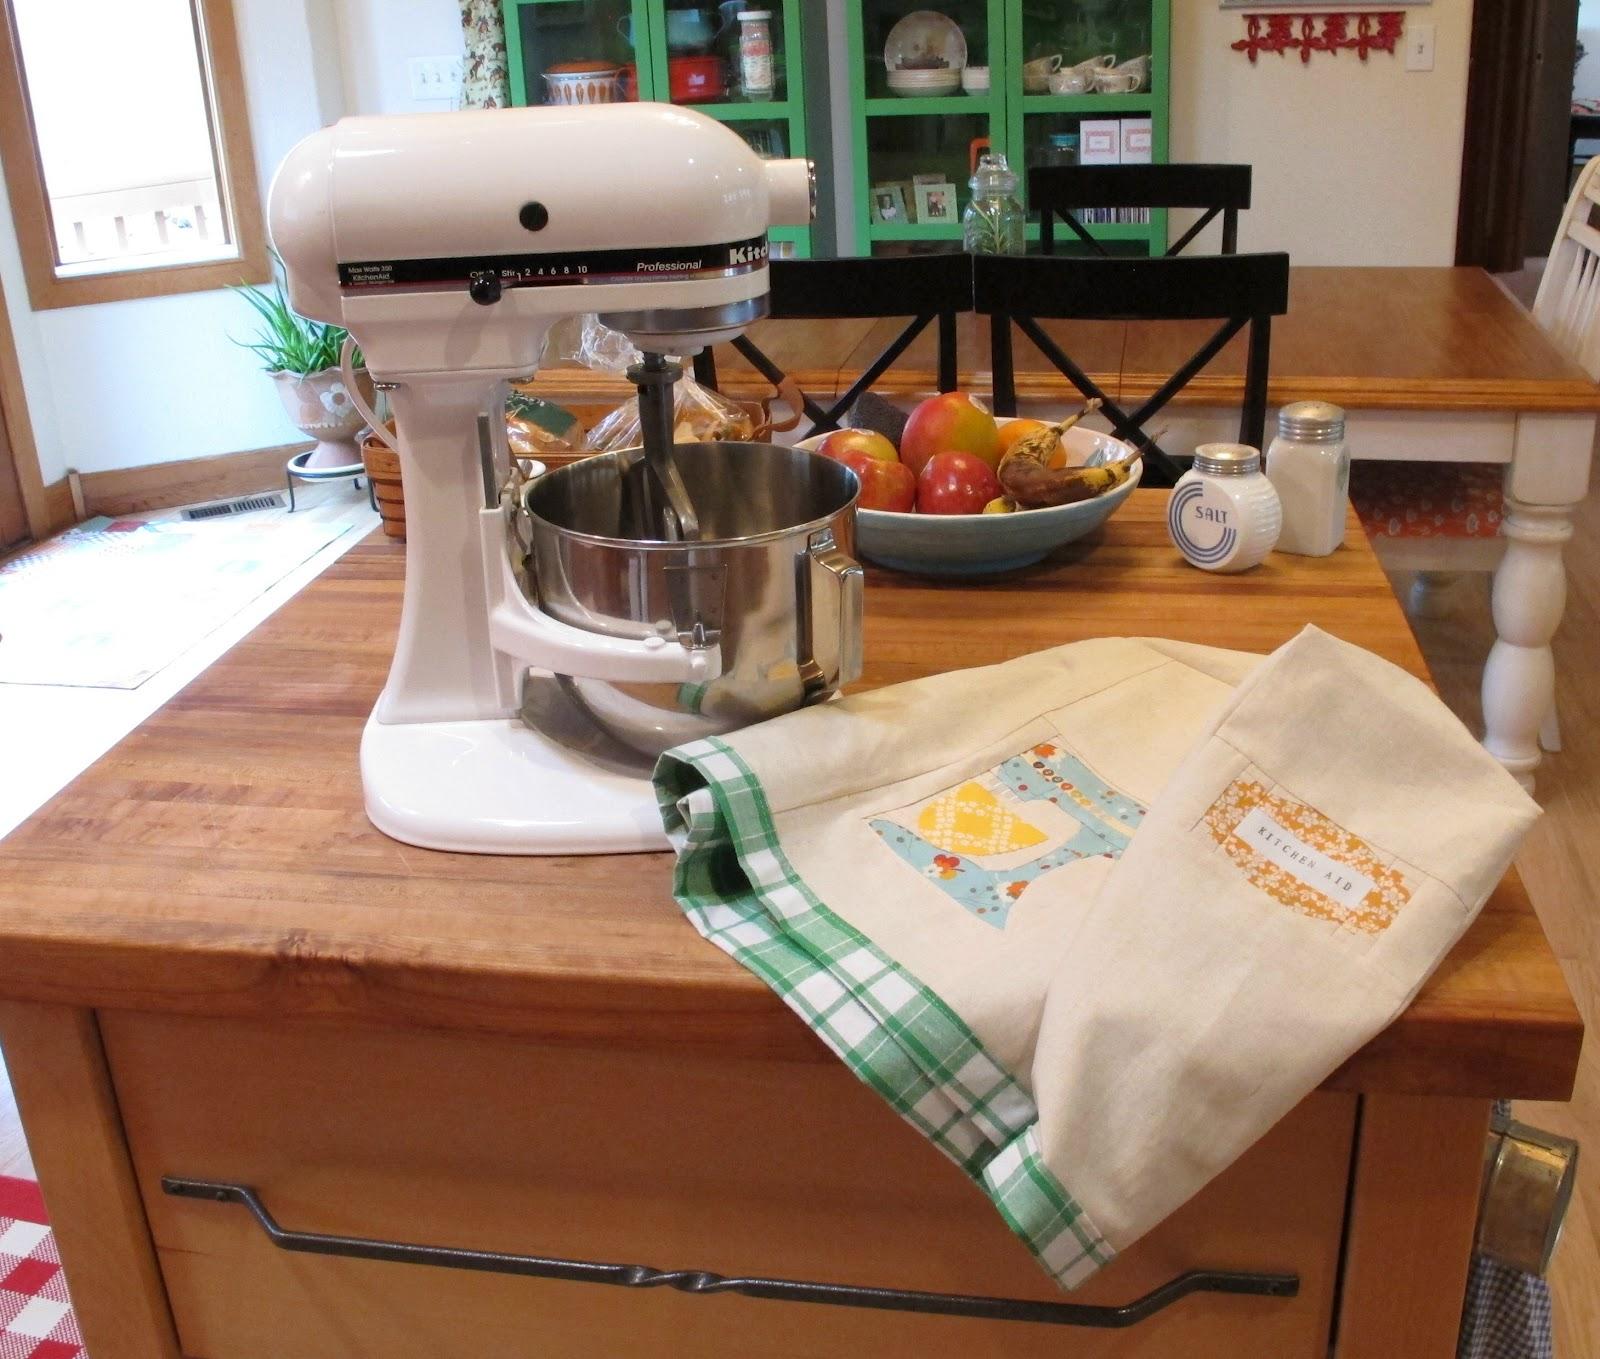 Sew ichigo april 2012 cover up your kitchenaid jeuxipadfo Choice Image